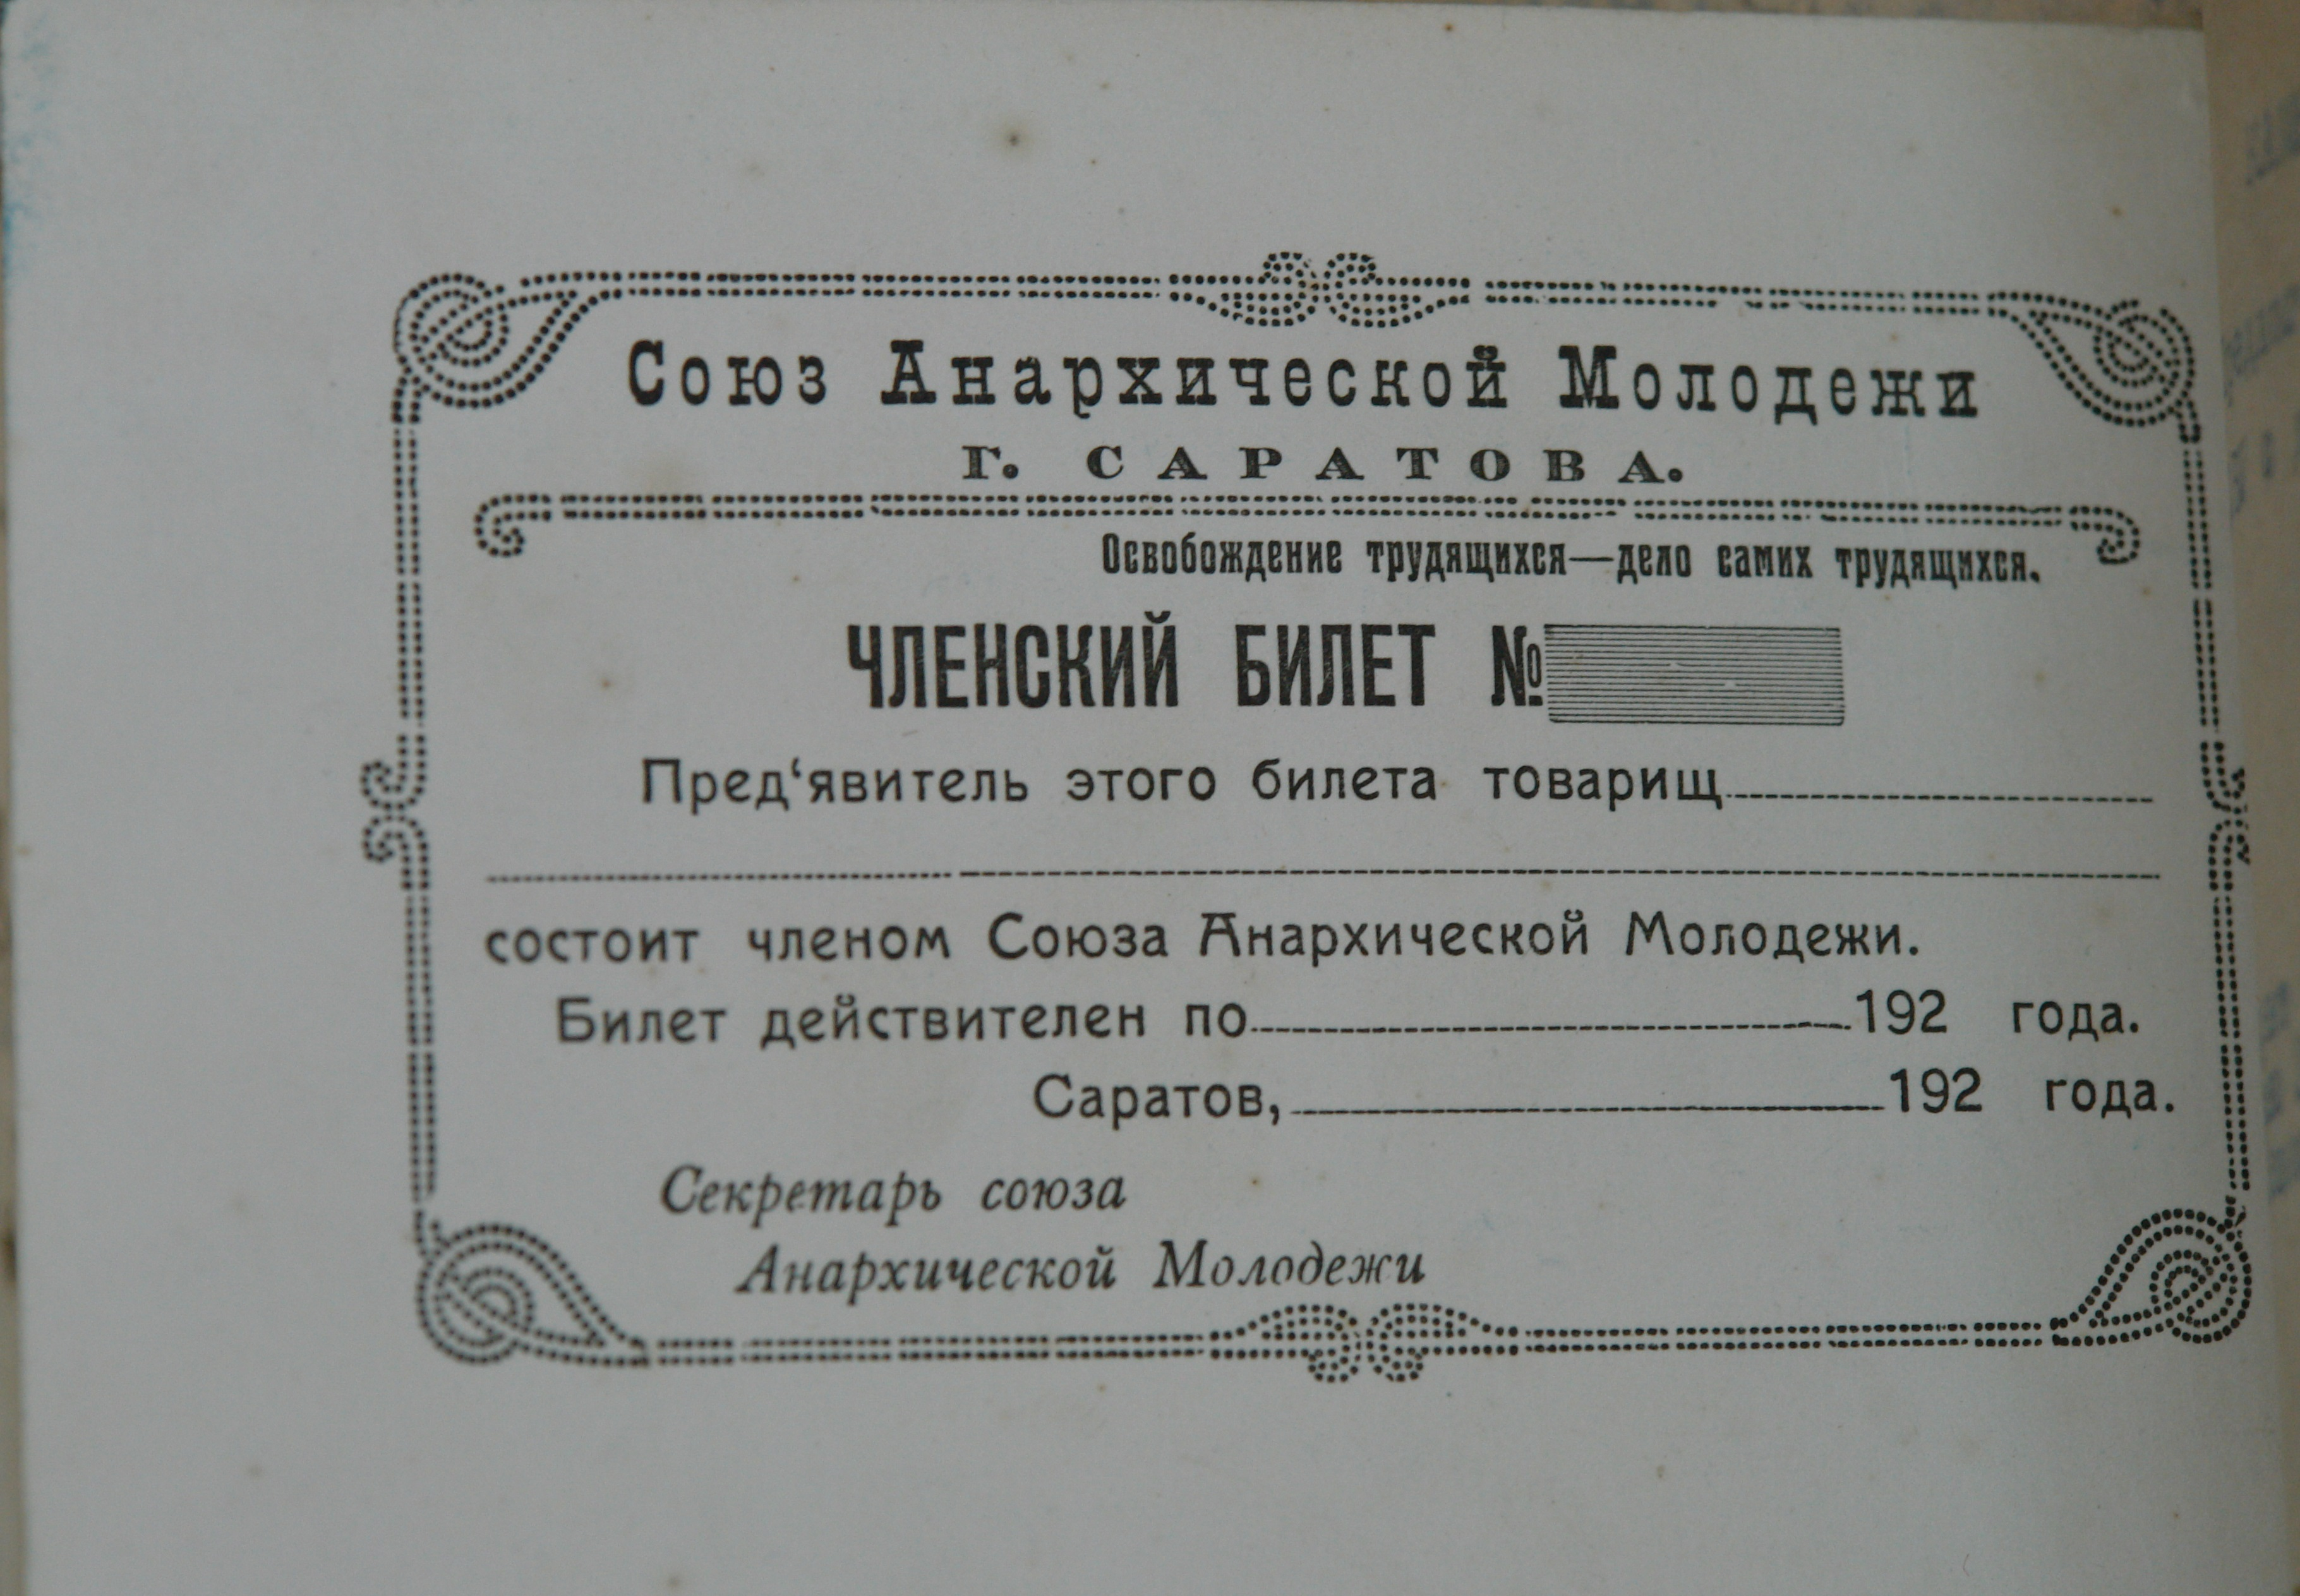 http://s3.uploads.ru/FCnbz.jpg